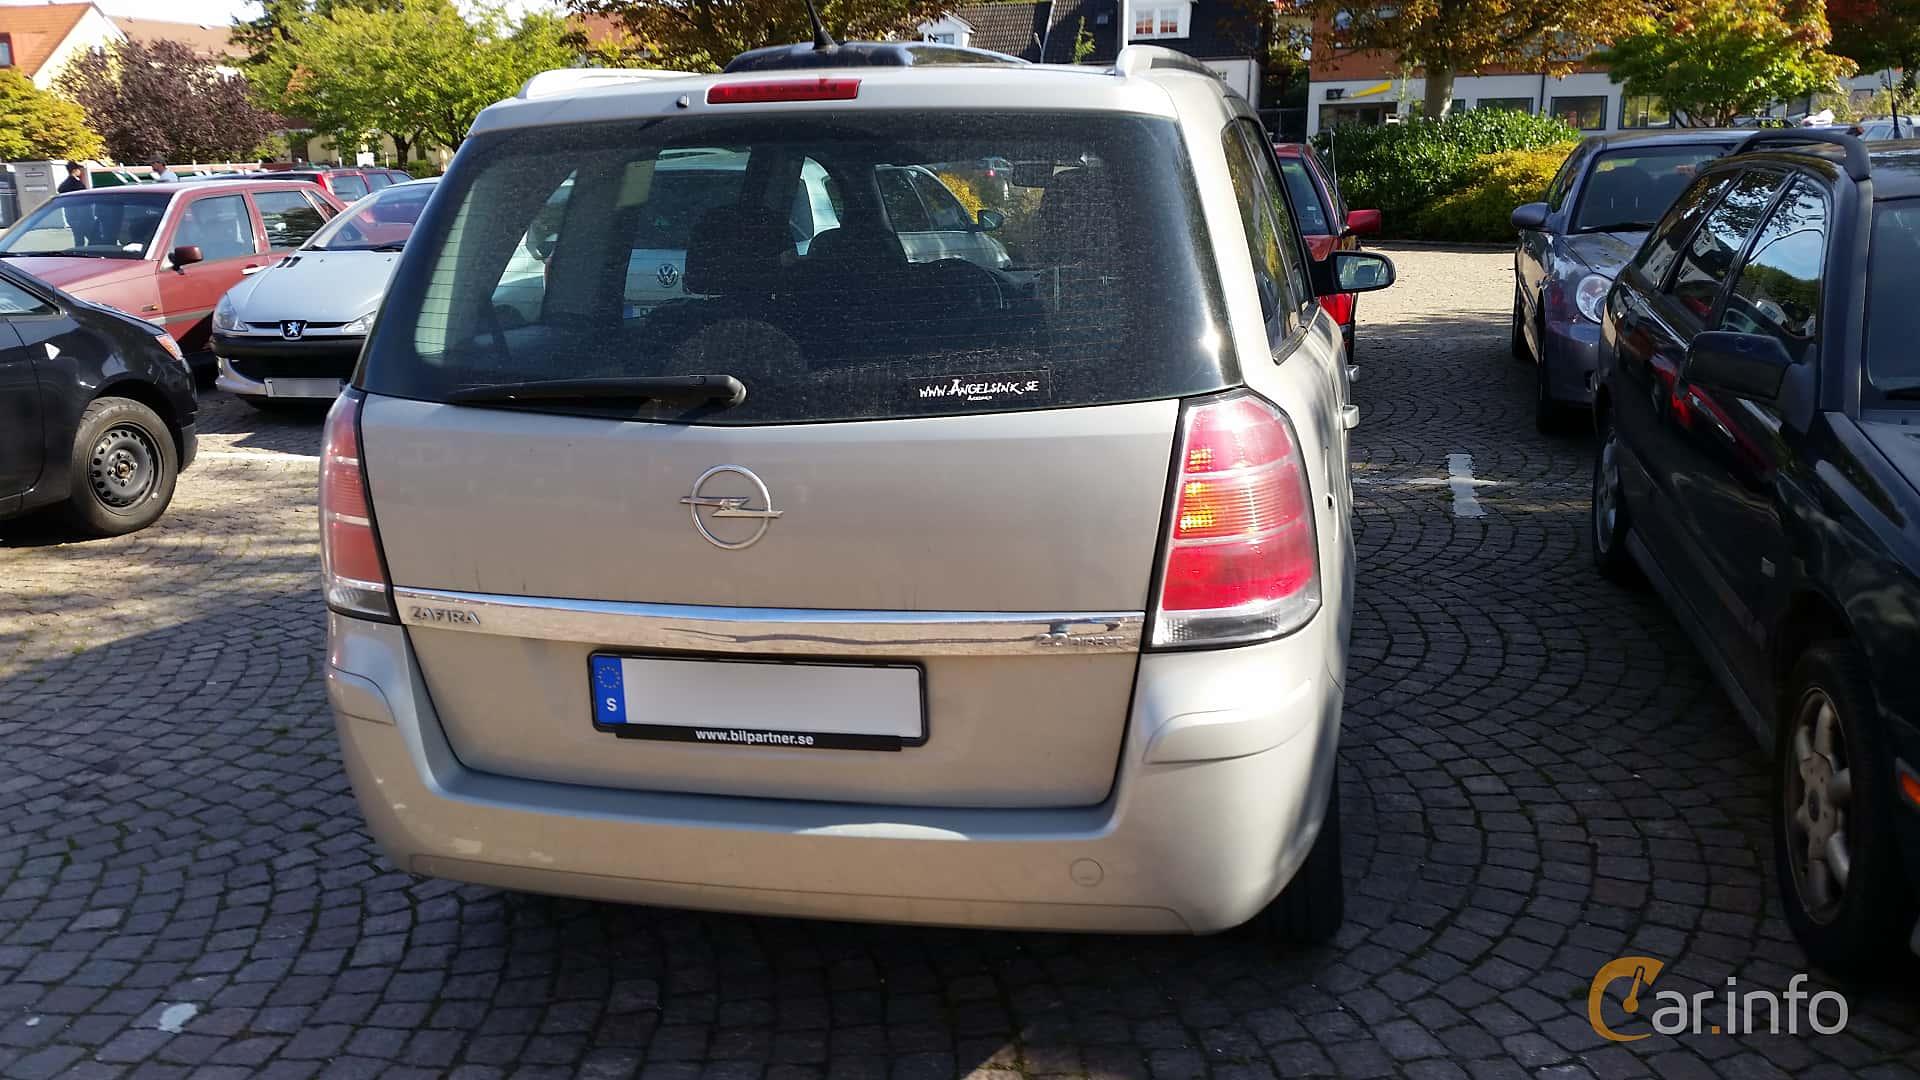 Back of Opel Zafira 2.2 Direct Manual, 150ps, 2006